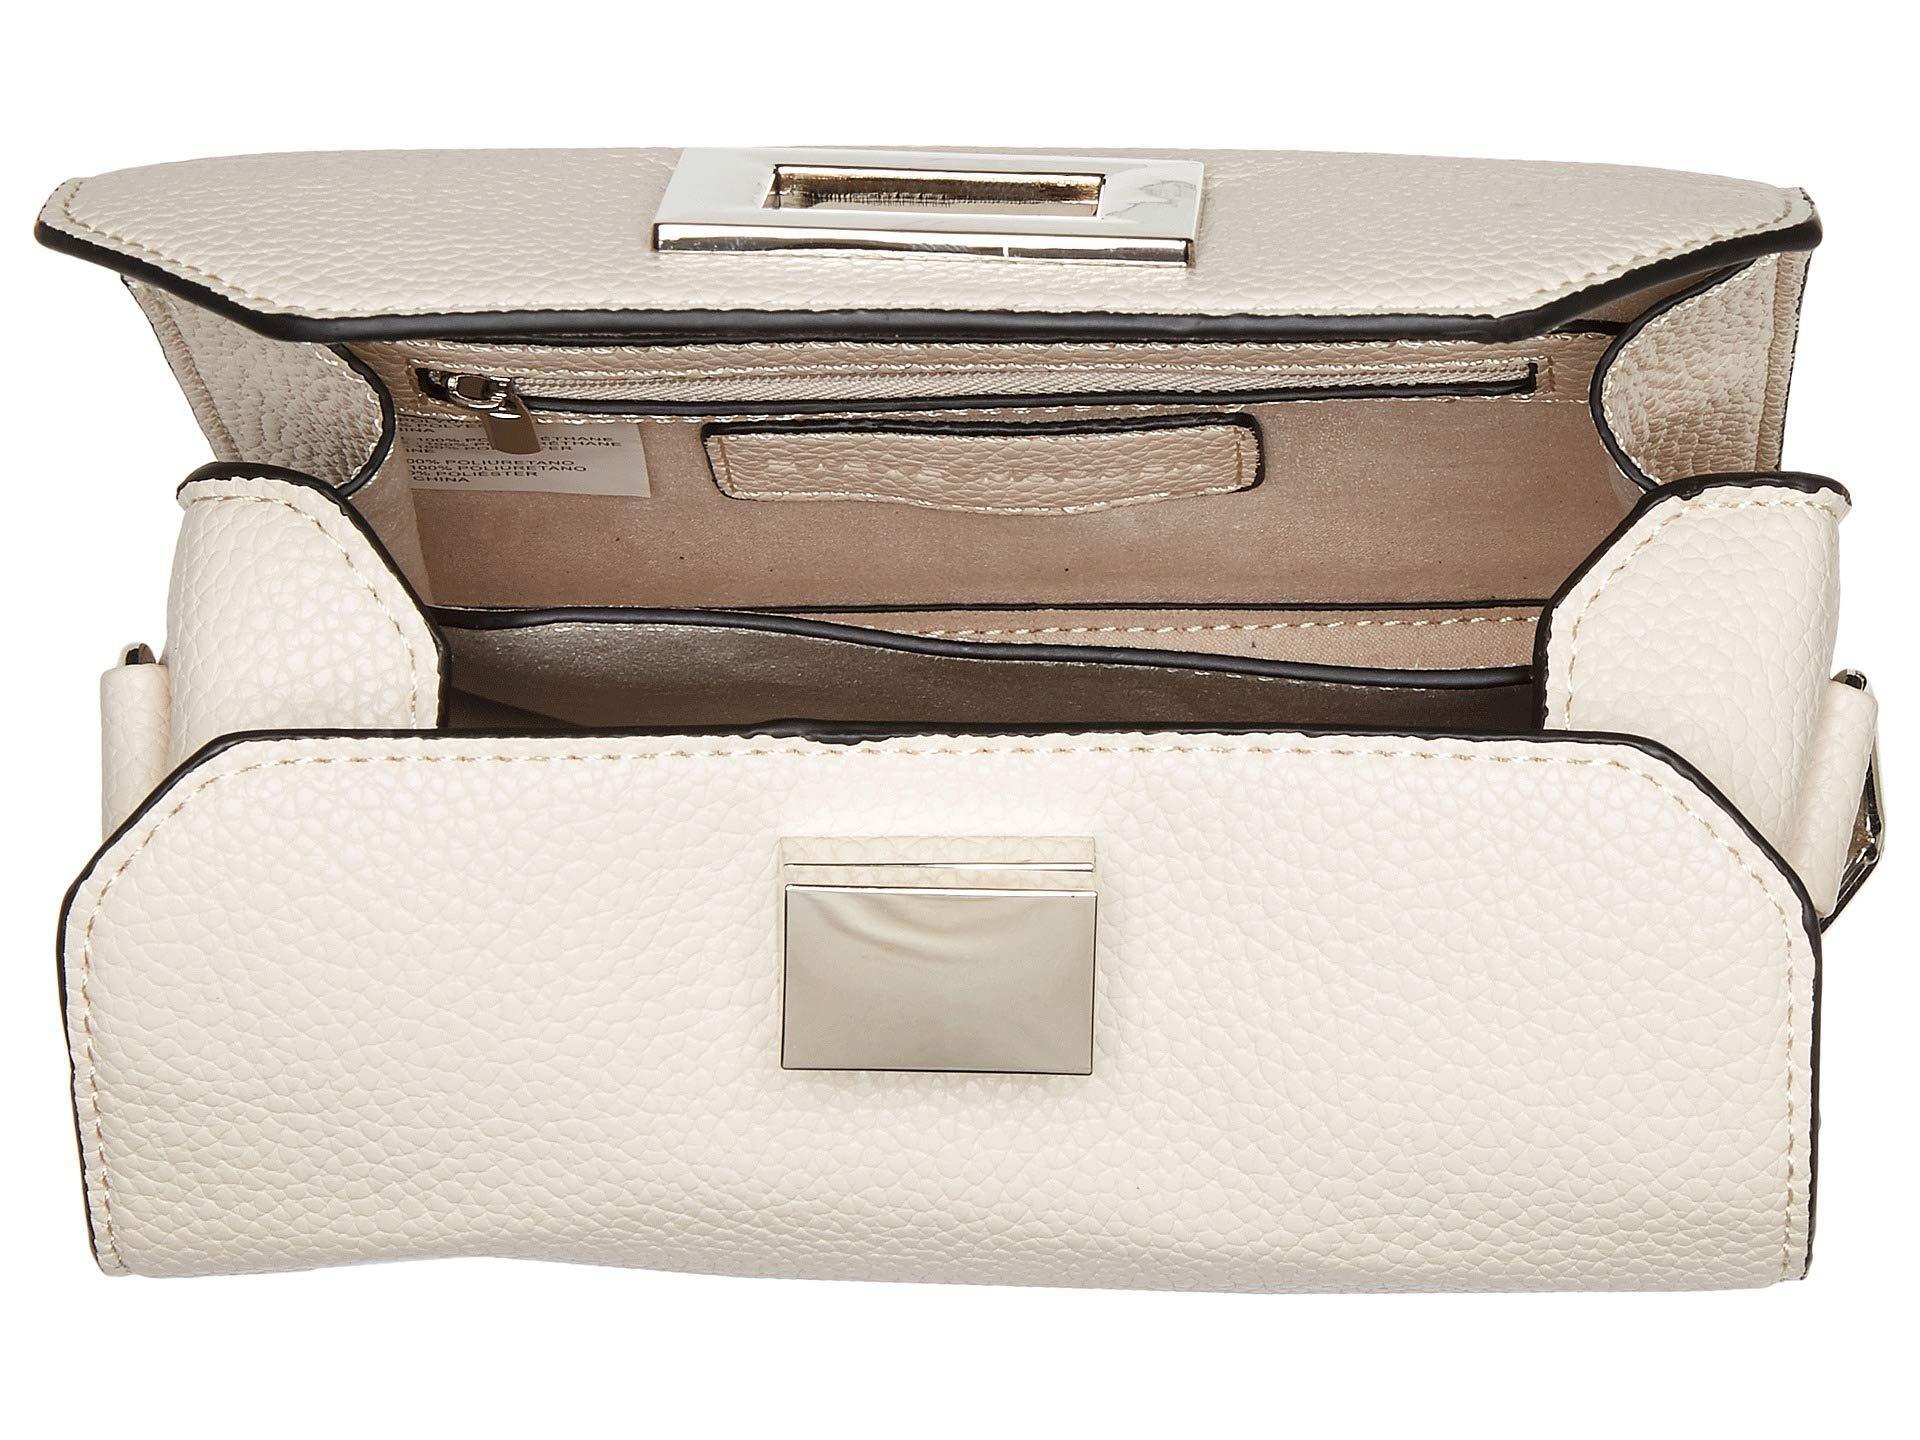 Lyst - Steve Madden Bkween (cream) Cross Body Handbags in Natural 03e756d7d846b